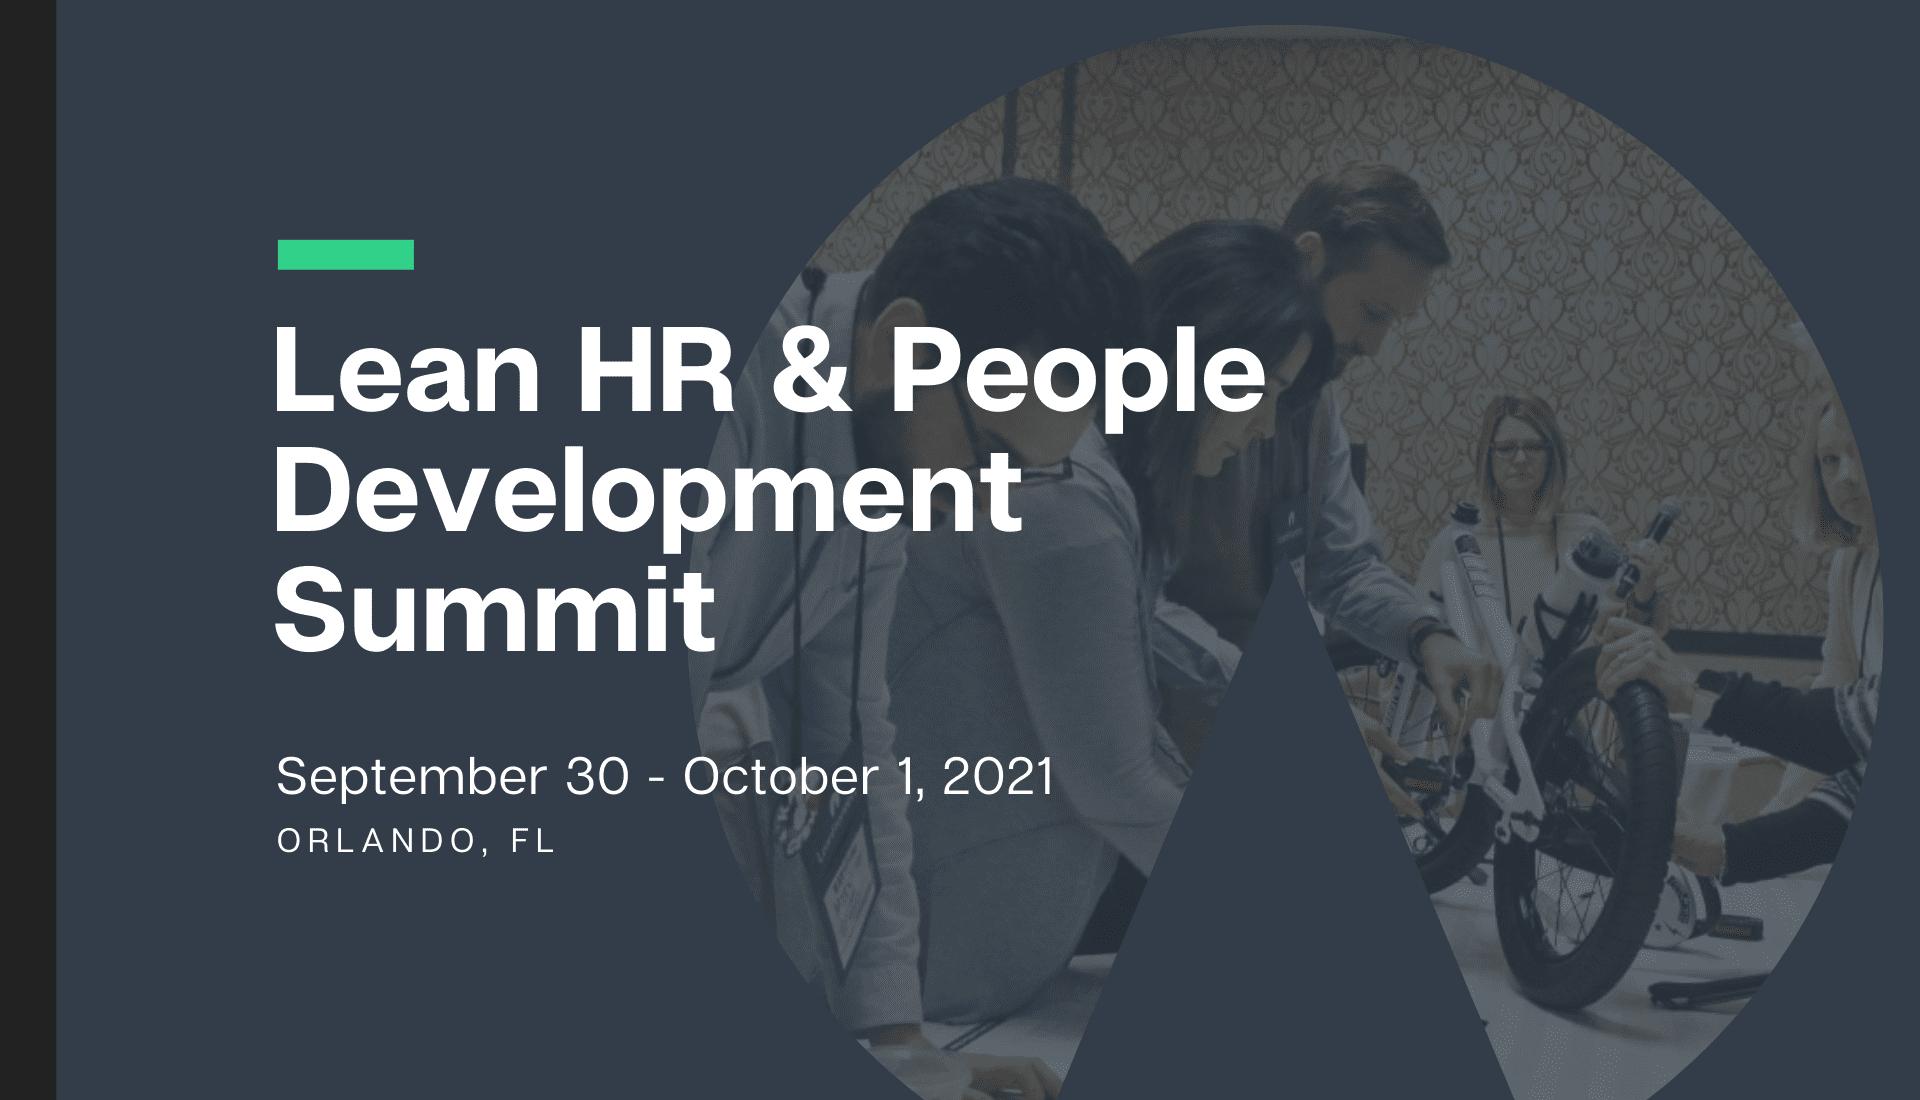 Lean HR & People Development Summit